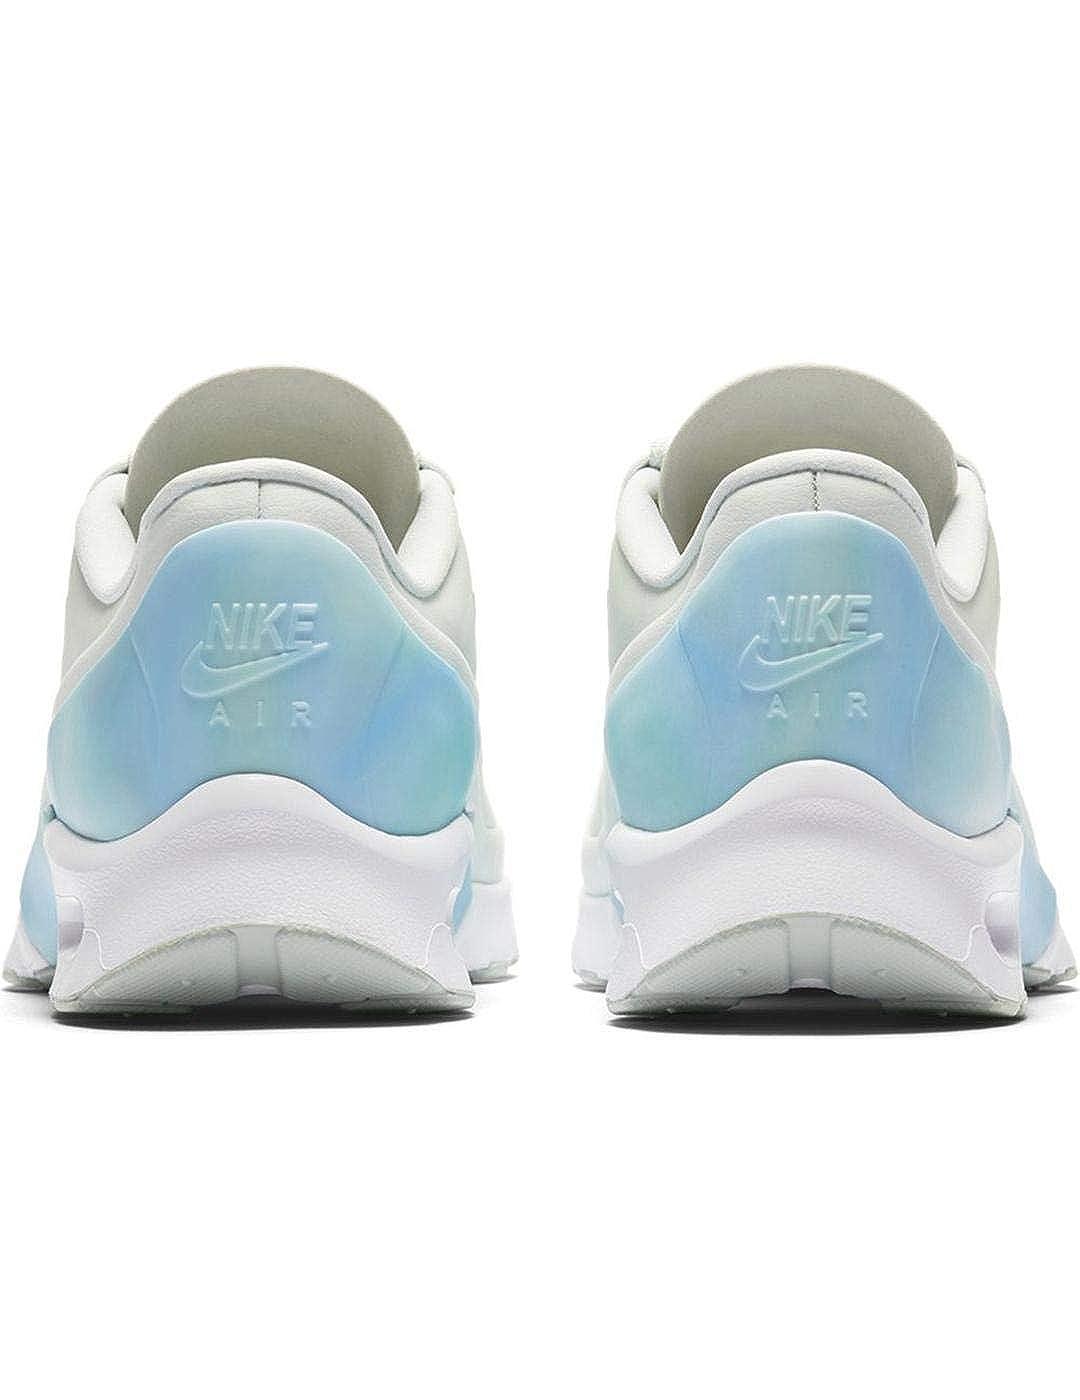 Nike Air Max Jewell Premium Barely GreyLight Pumice